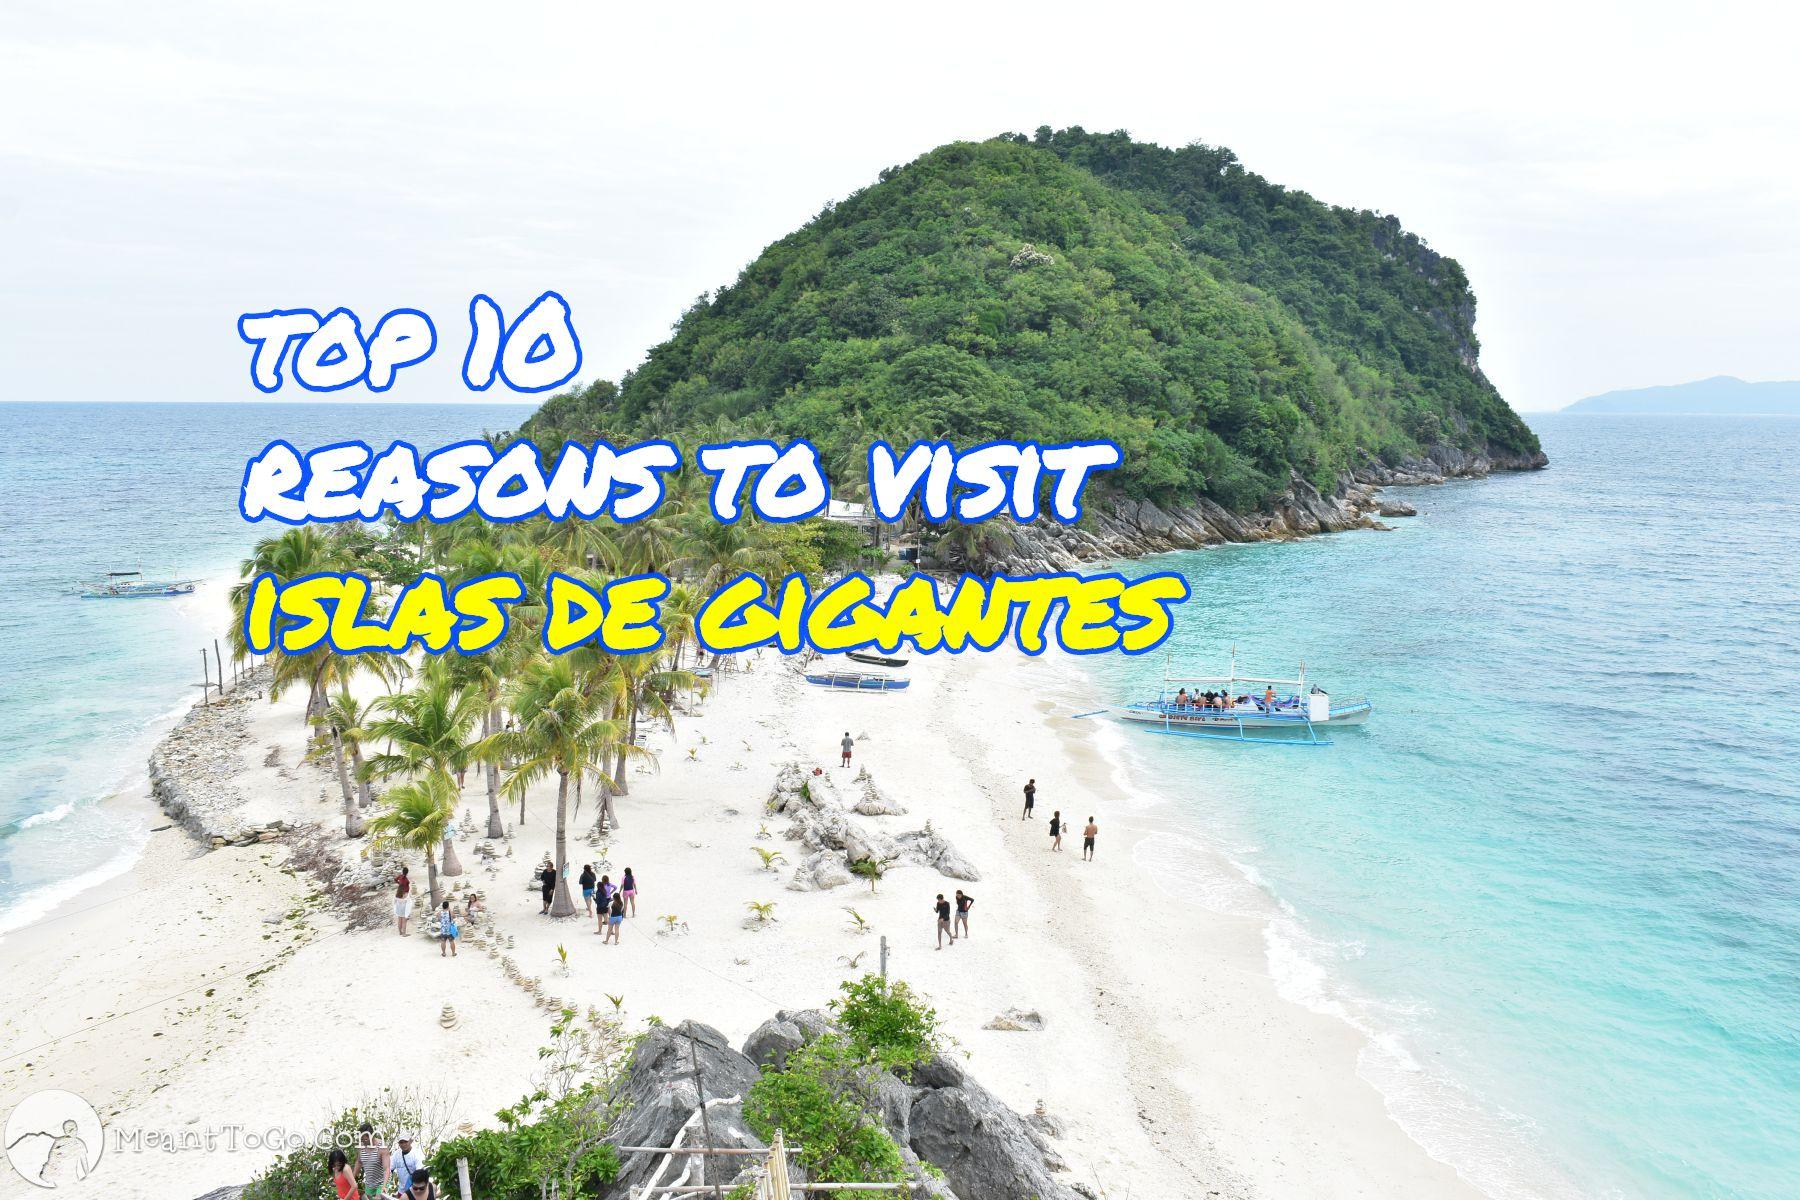 cabugaw gamay, Islas de Gigantes